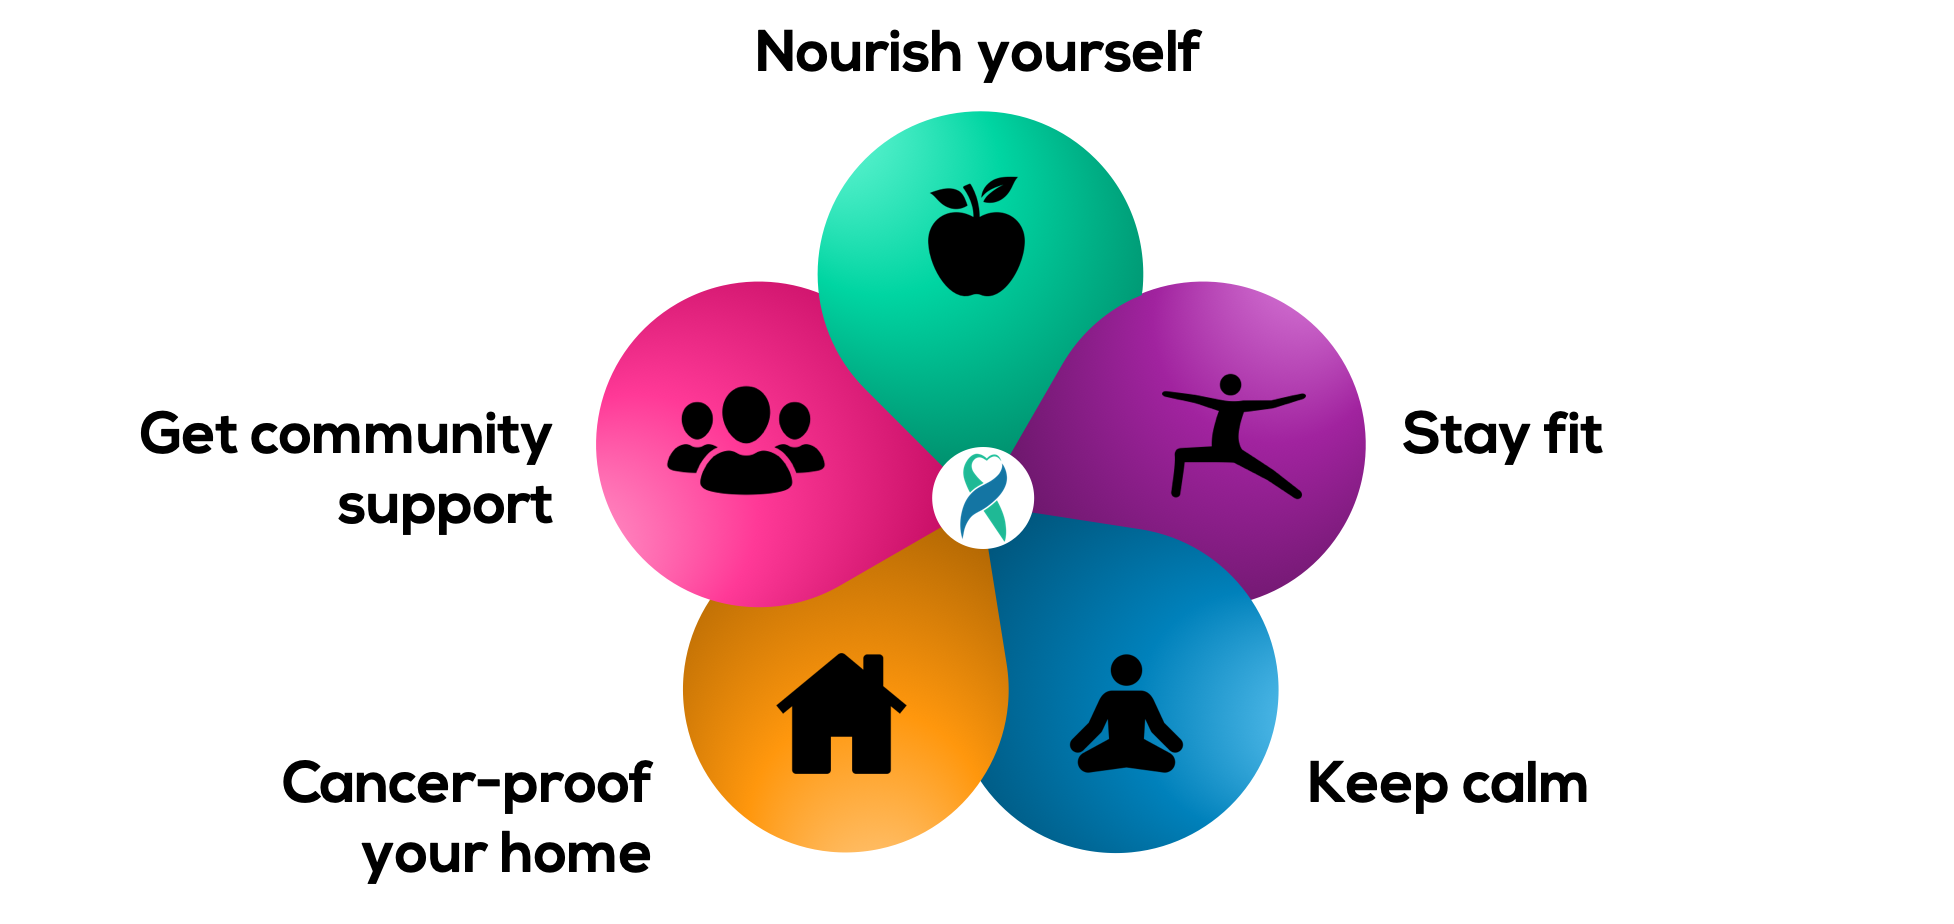 5 Wellness Practices